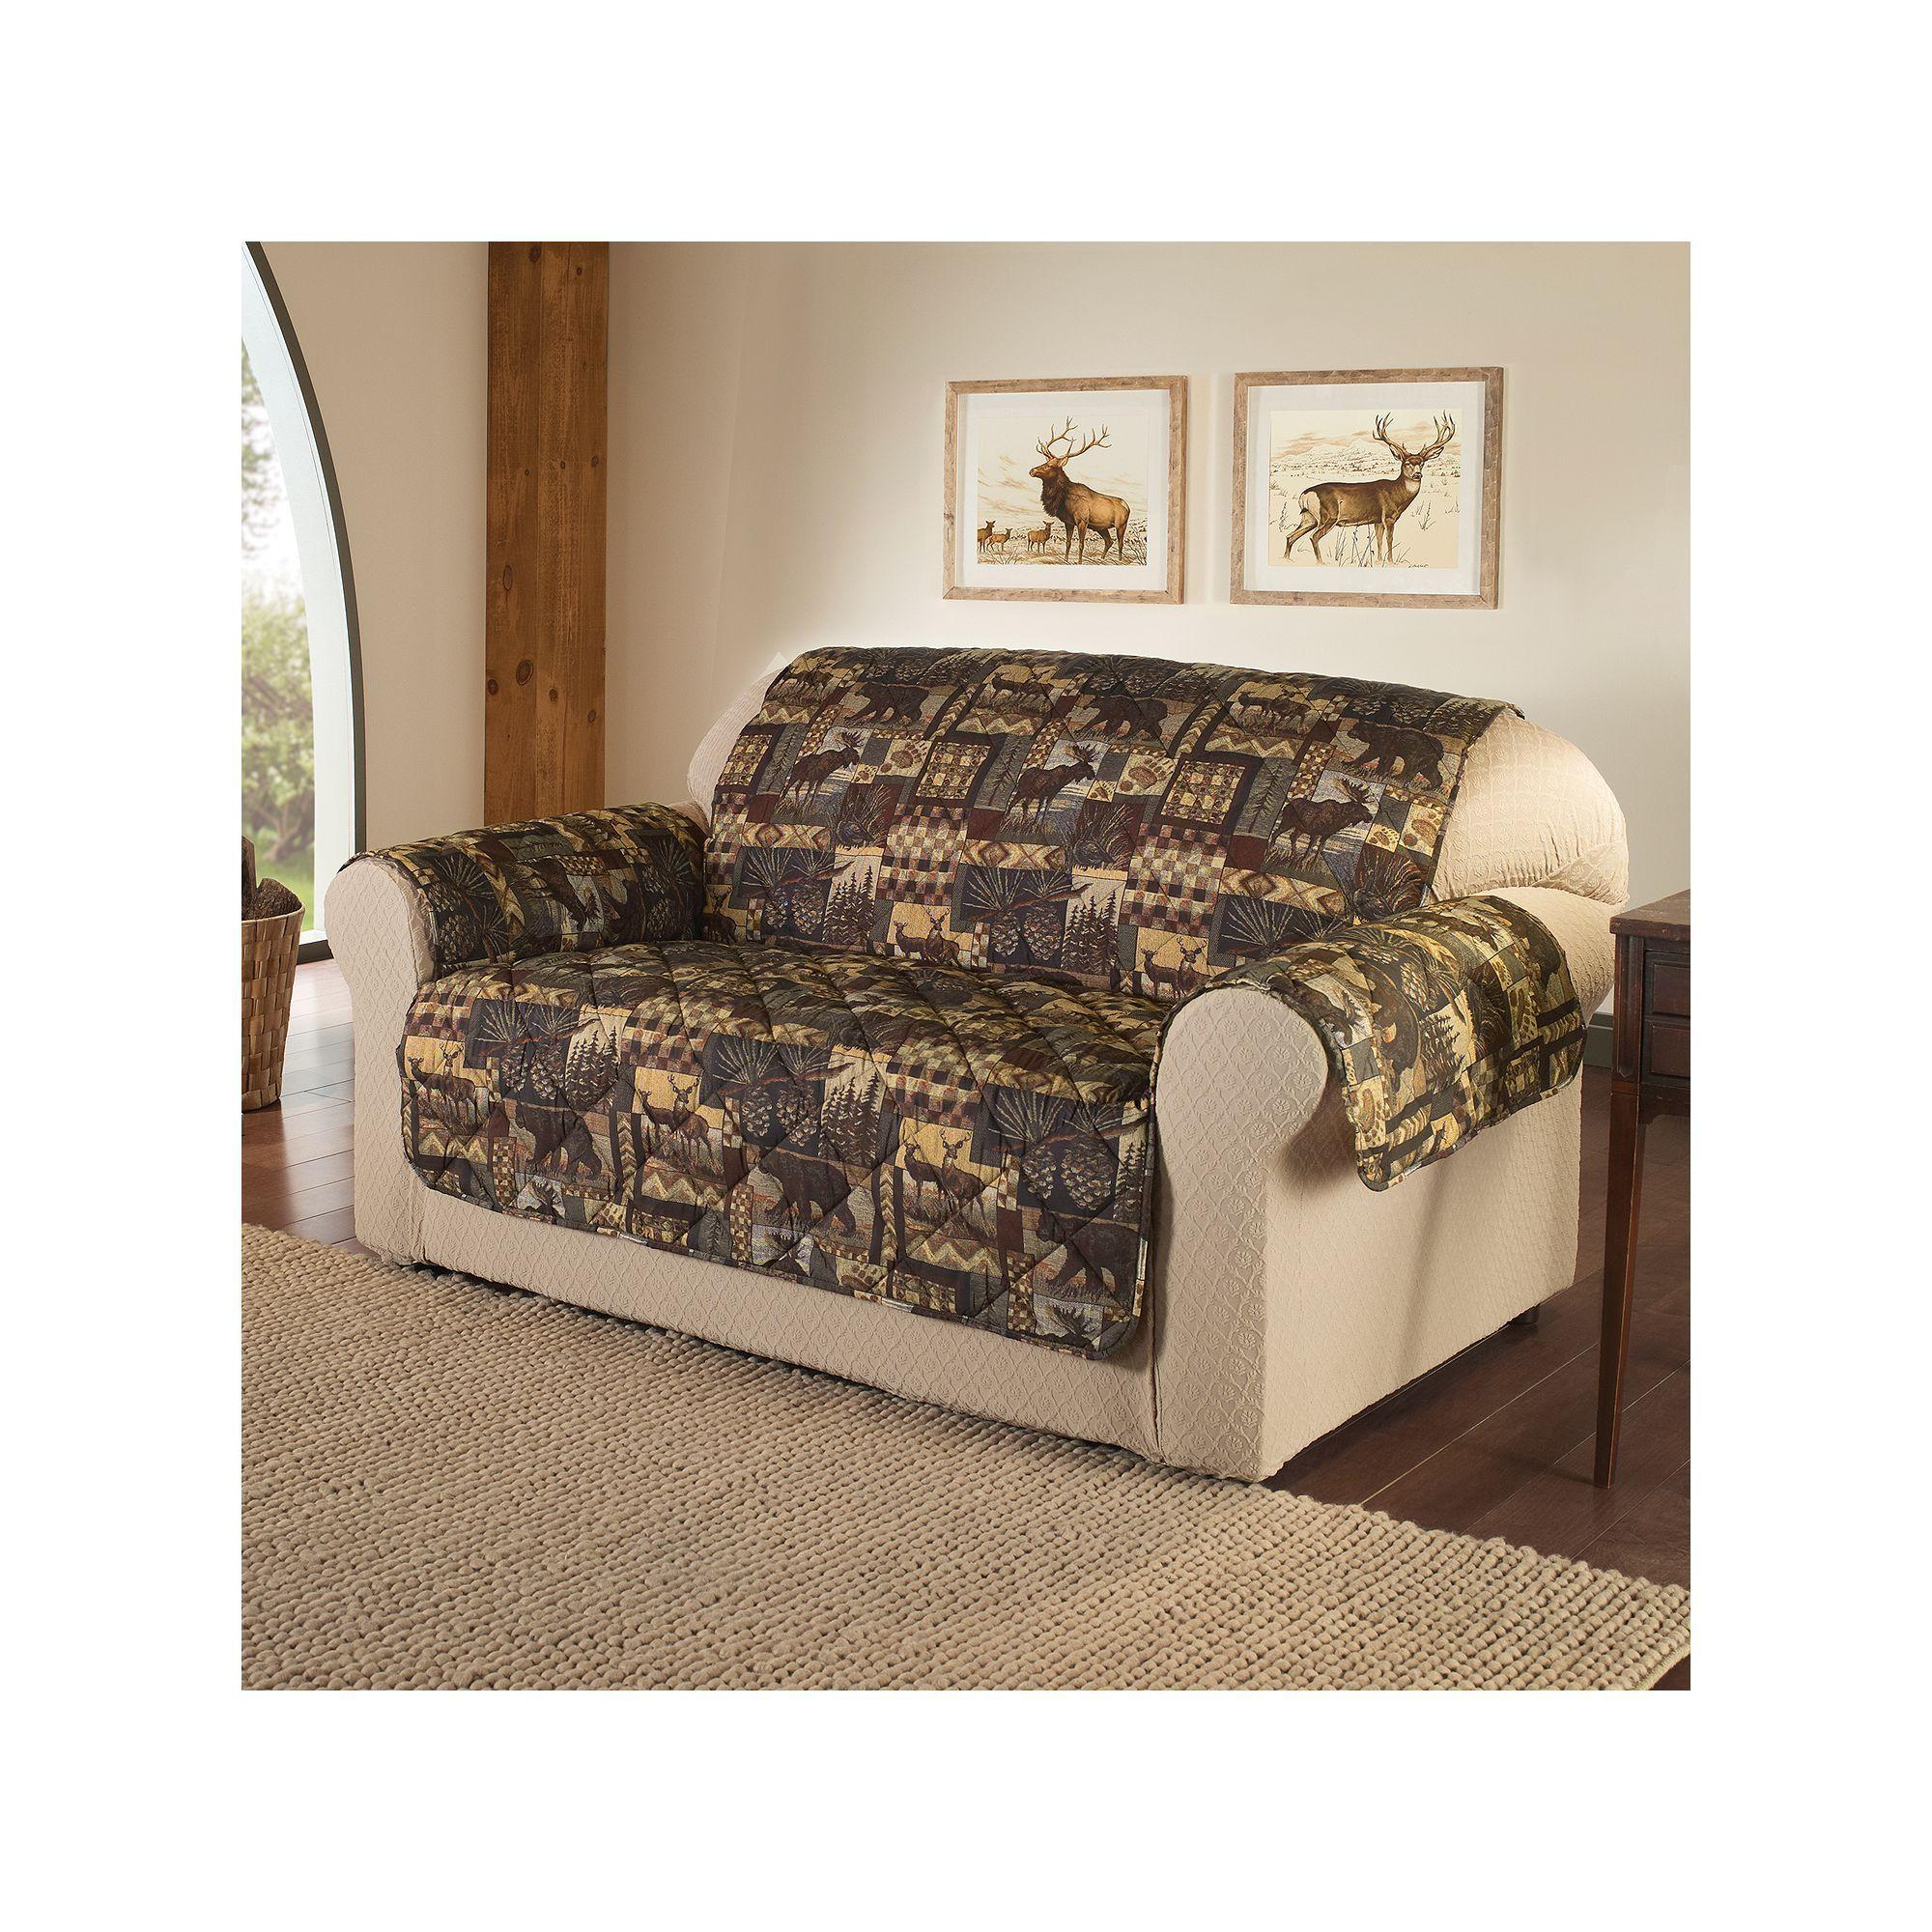 Outstanding Jeffrey Home Lodge Microfiber Loveseat Protector Products Creativecarmelina Interior Chair Design Creativecarmelinacom